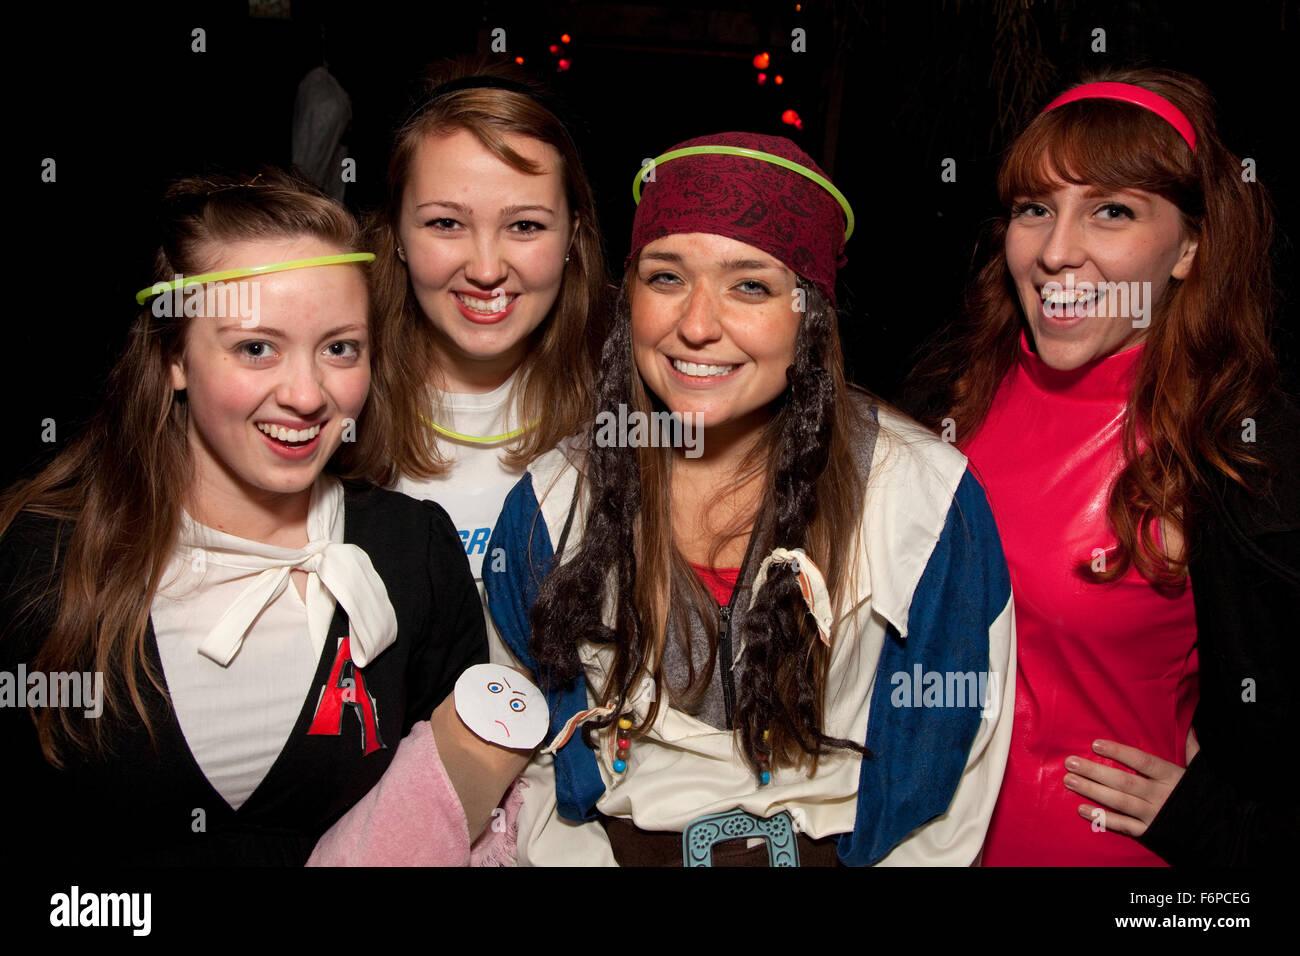 Costumed Halloween trick or treating teen girls. St Paul Minnesota MN USA - Stock Image